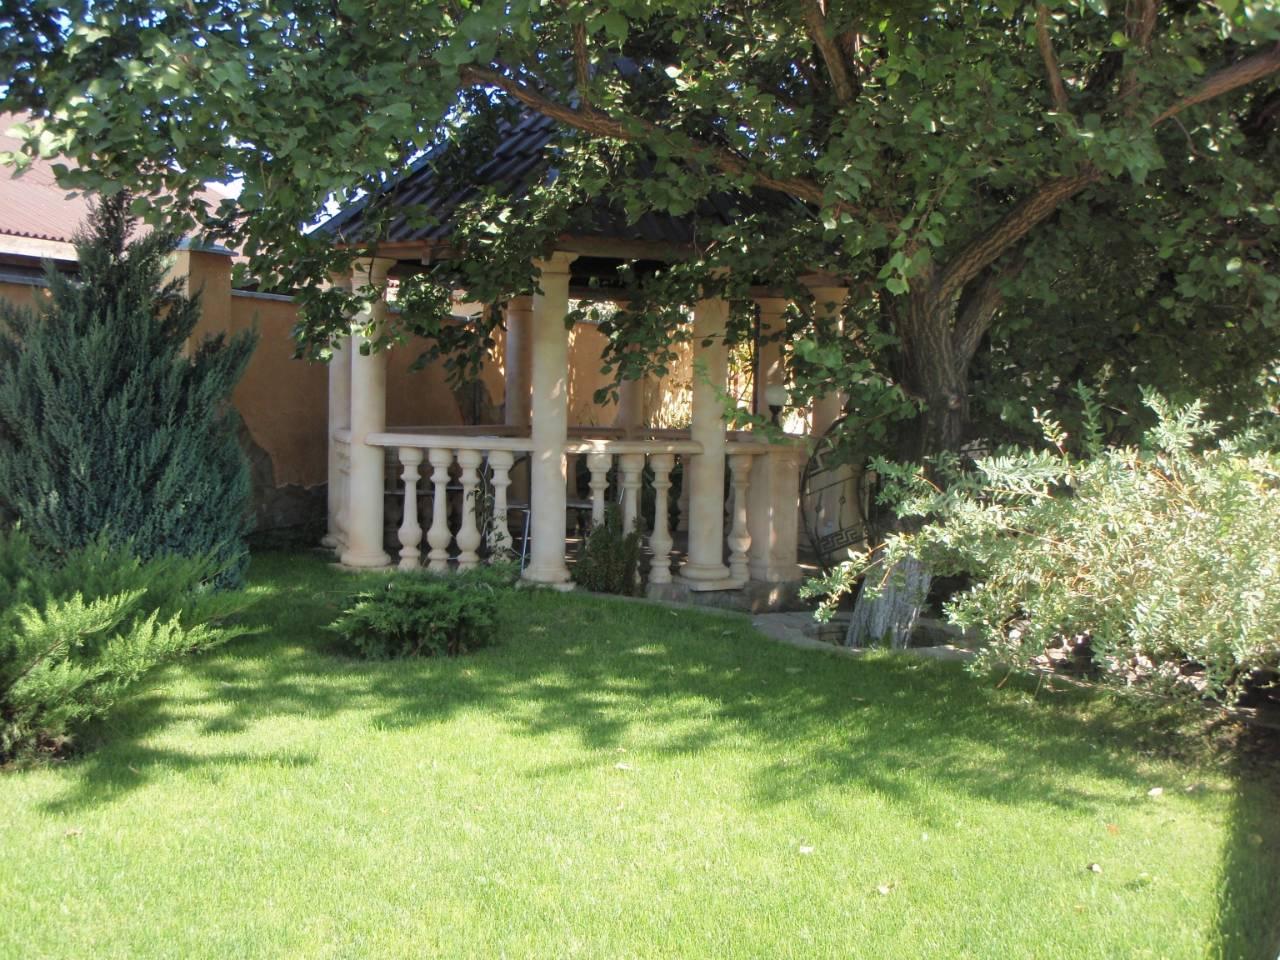 Продается Дом на ул. Ивана Липы (Калинина) — 550 000 у.е. (фото №20)